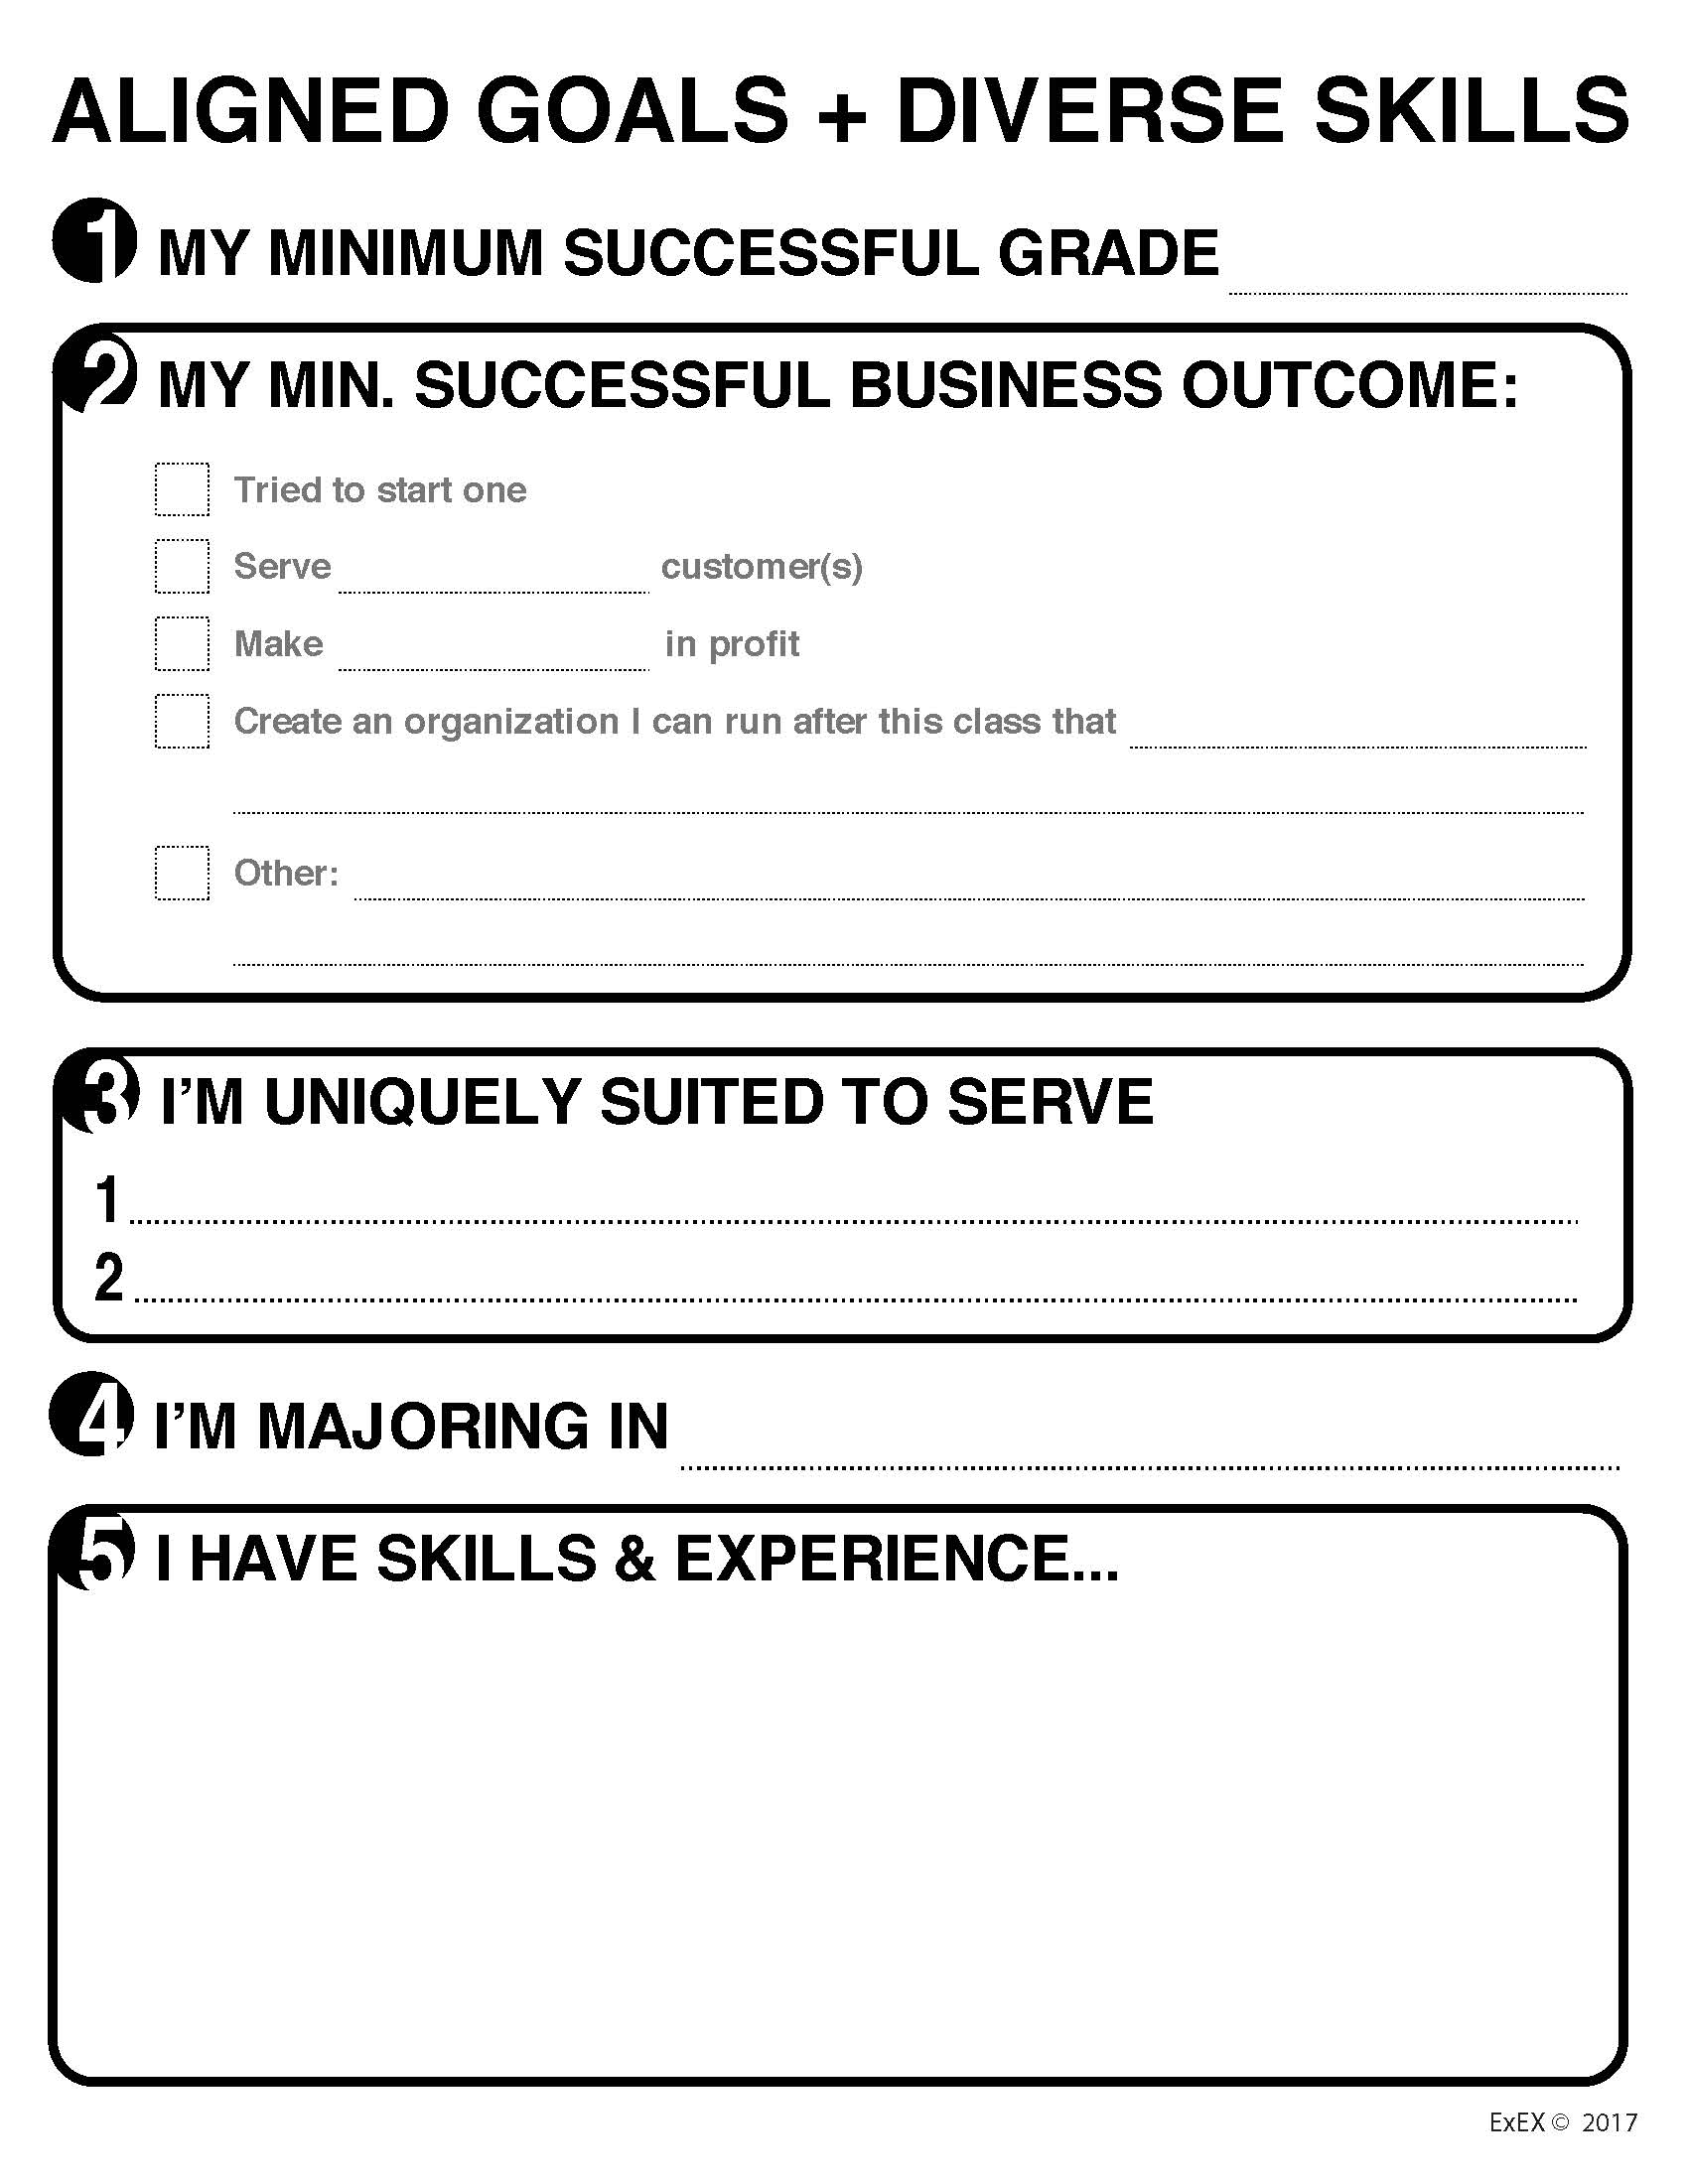 Aligned Goals Diverse Skills Page 1